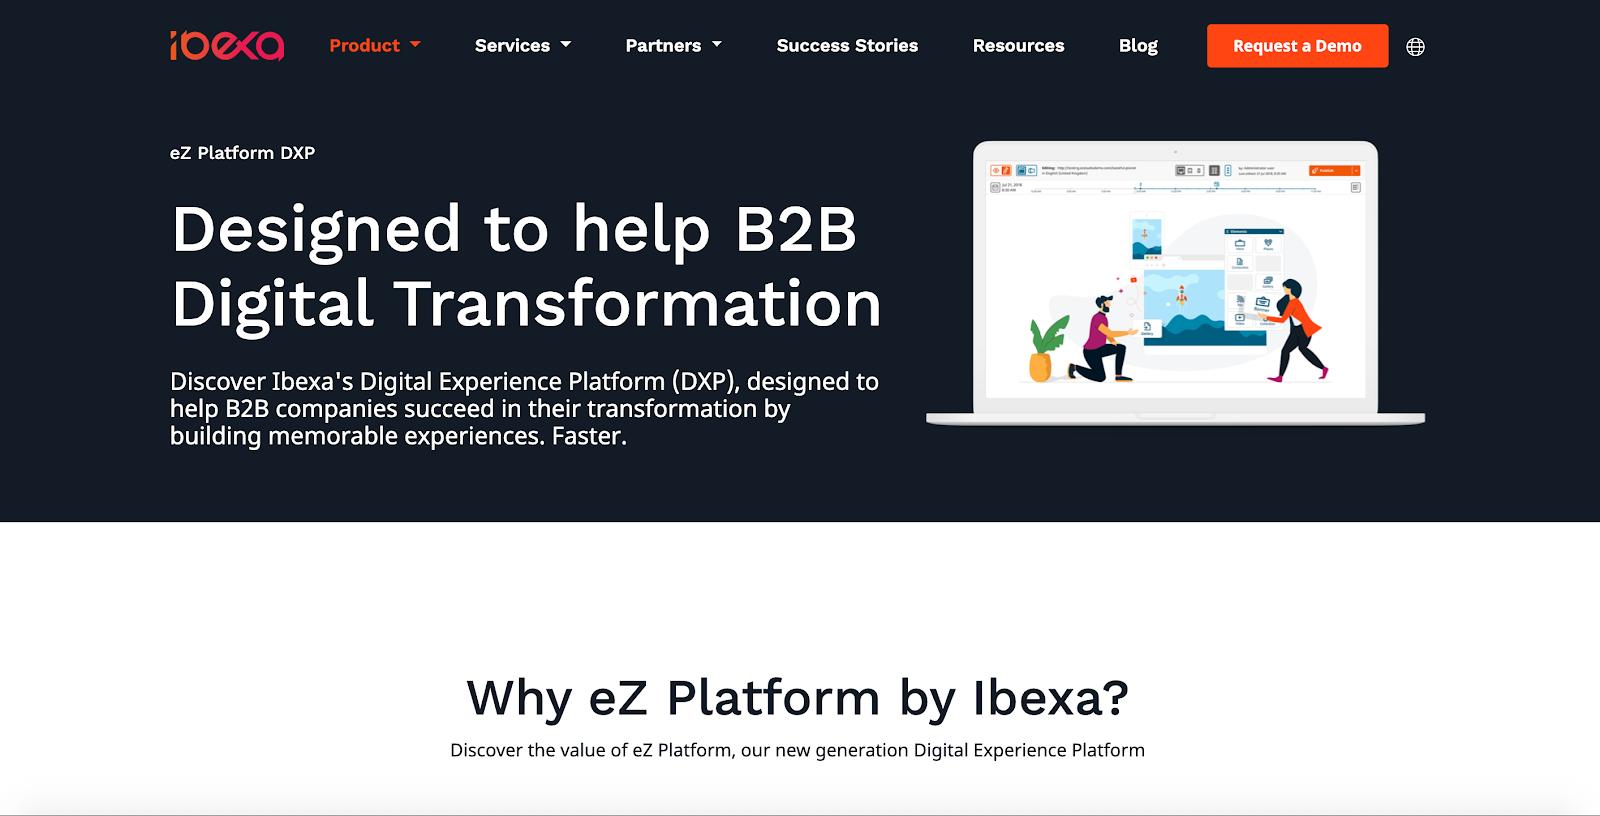 eZ Platform includes a native page builder, is designed on full-stack PHP, and built for enterprises.